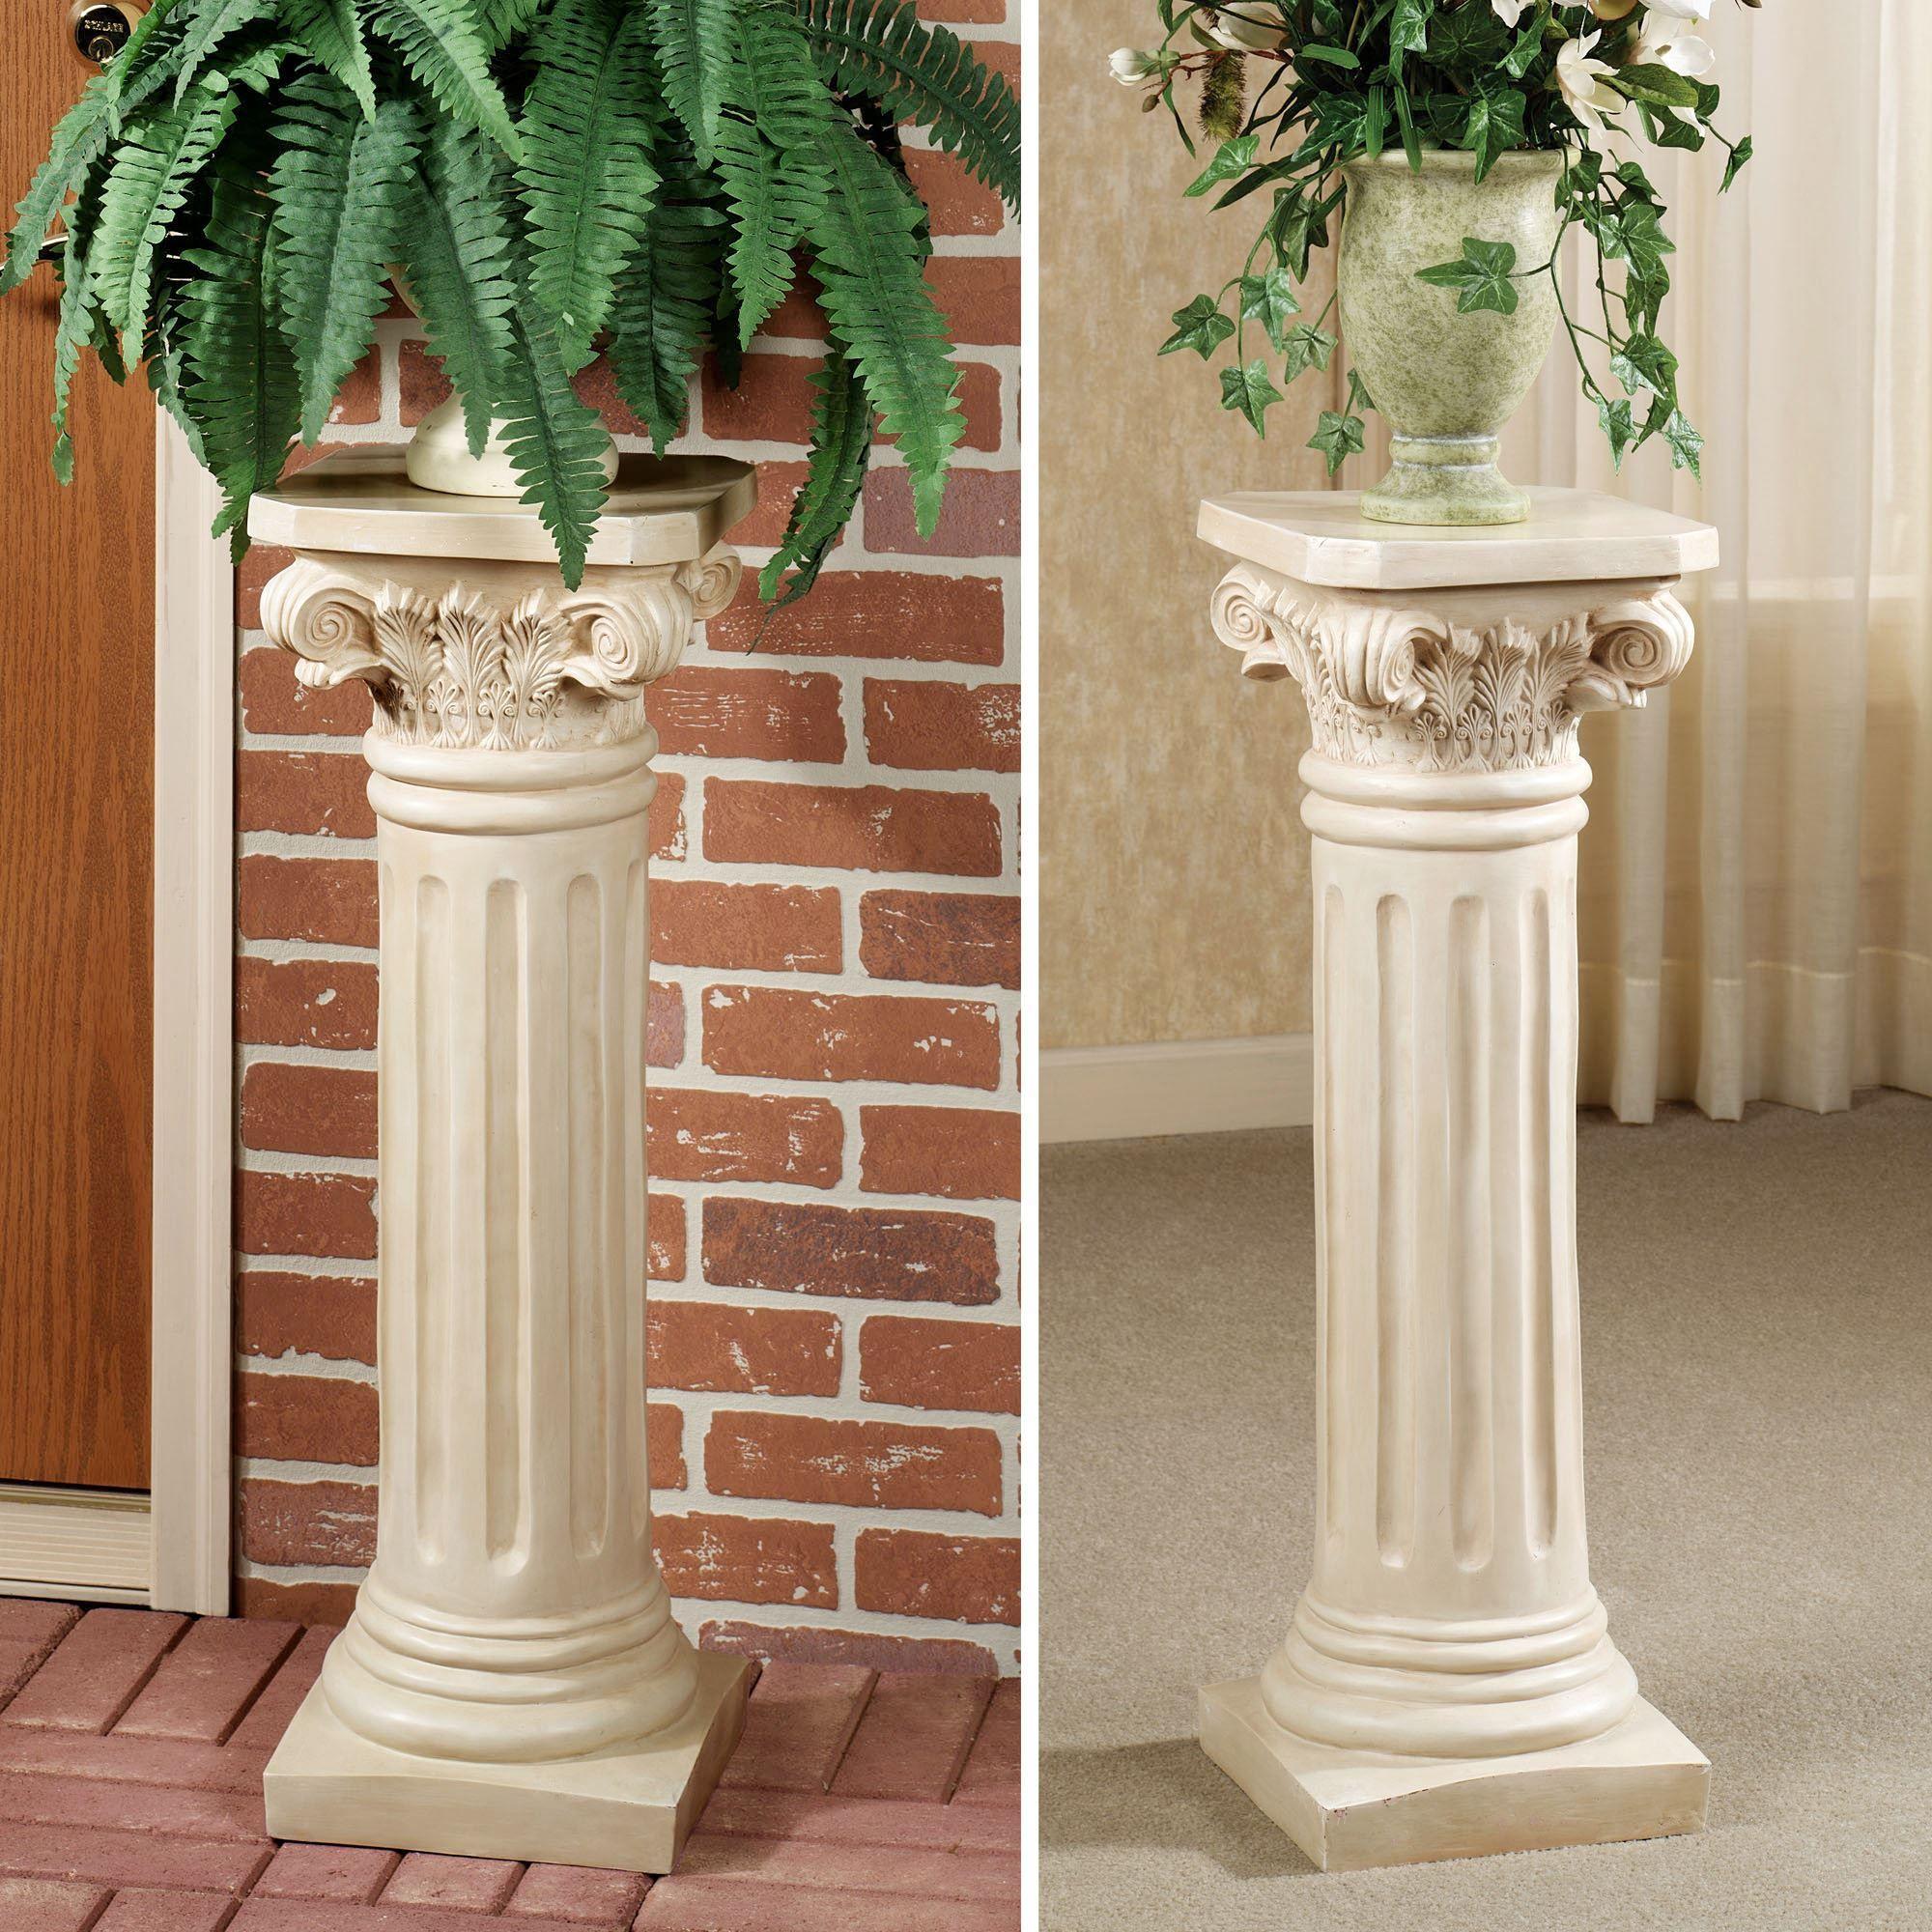 Classic Roman Column Pedestal Columns Decor Roman Columns Decor